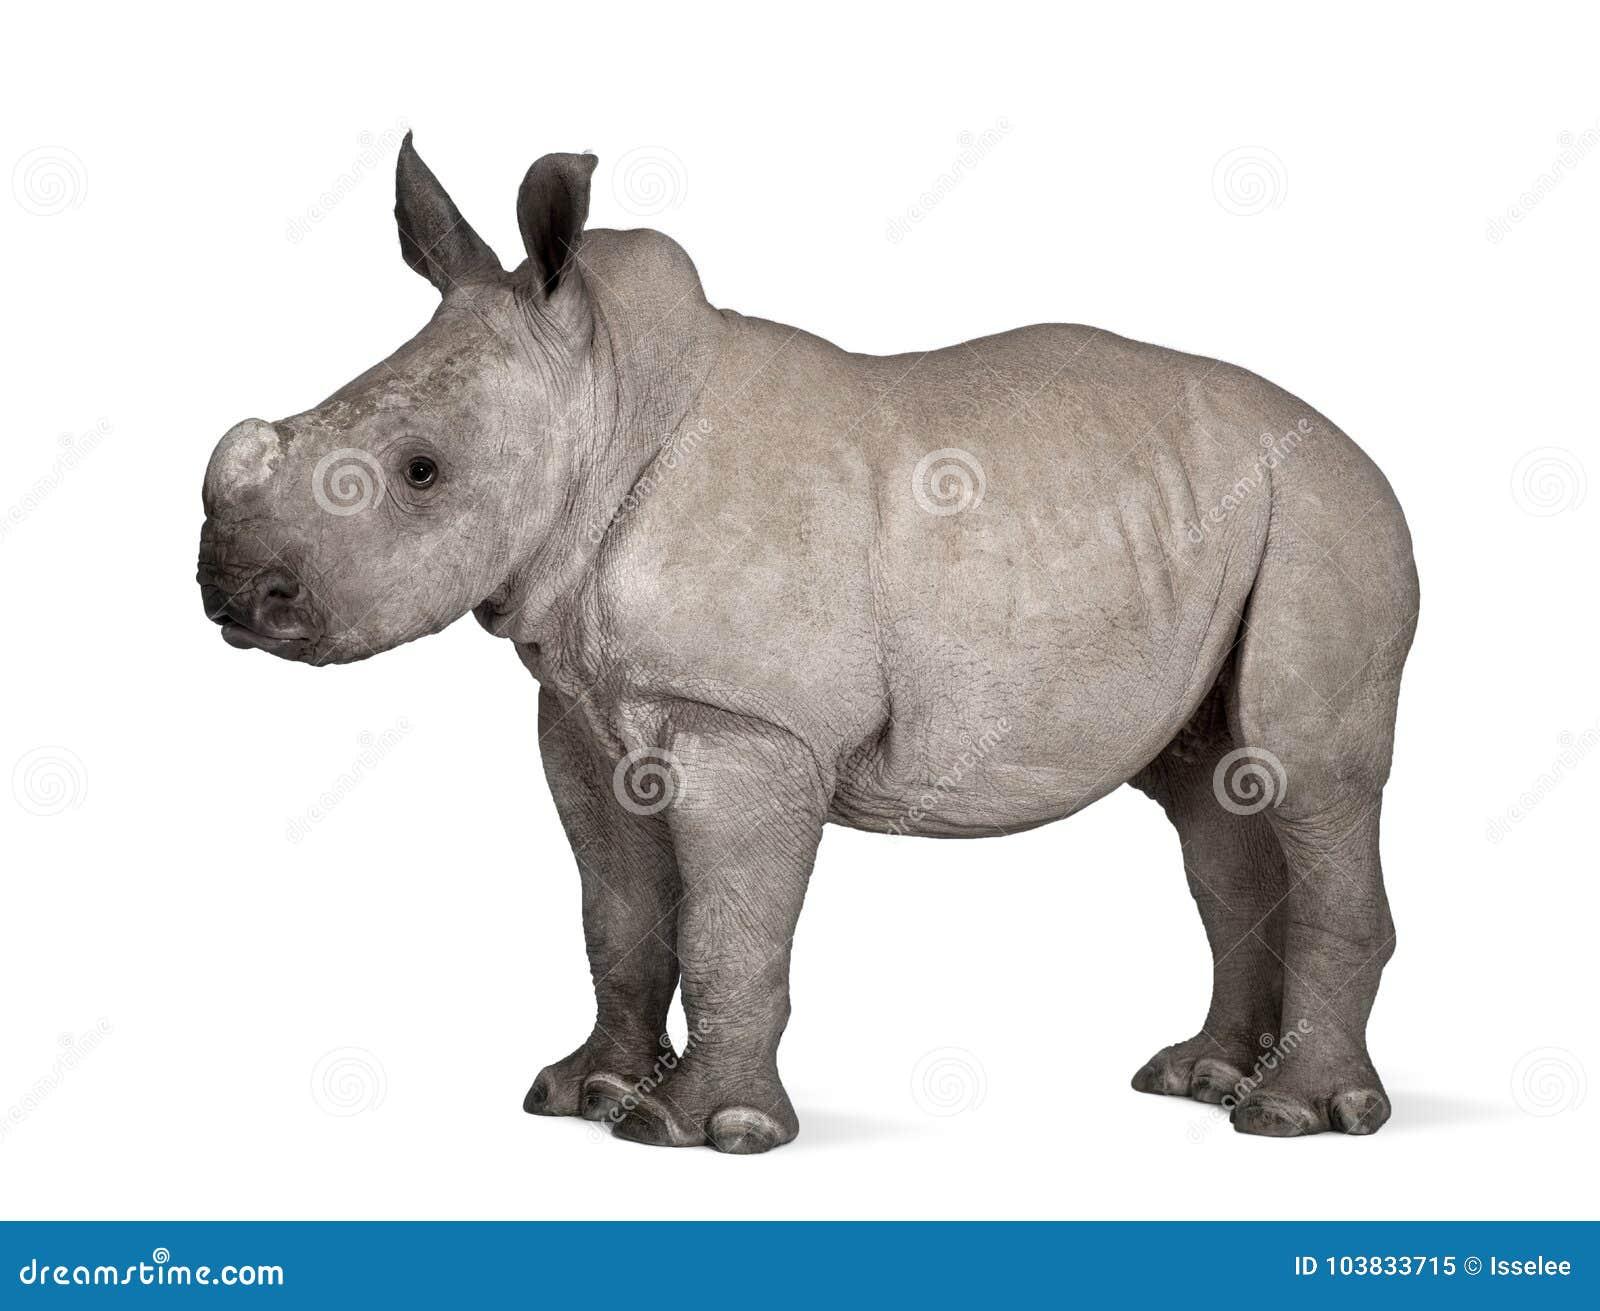 Jeune rhinocéros blanc ou rhinocéros Place-labié - Ceratotheri